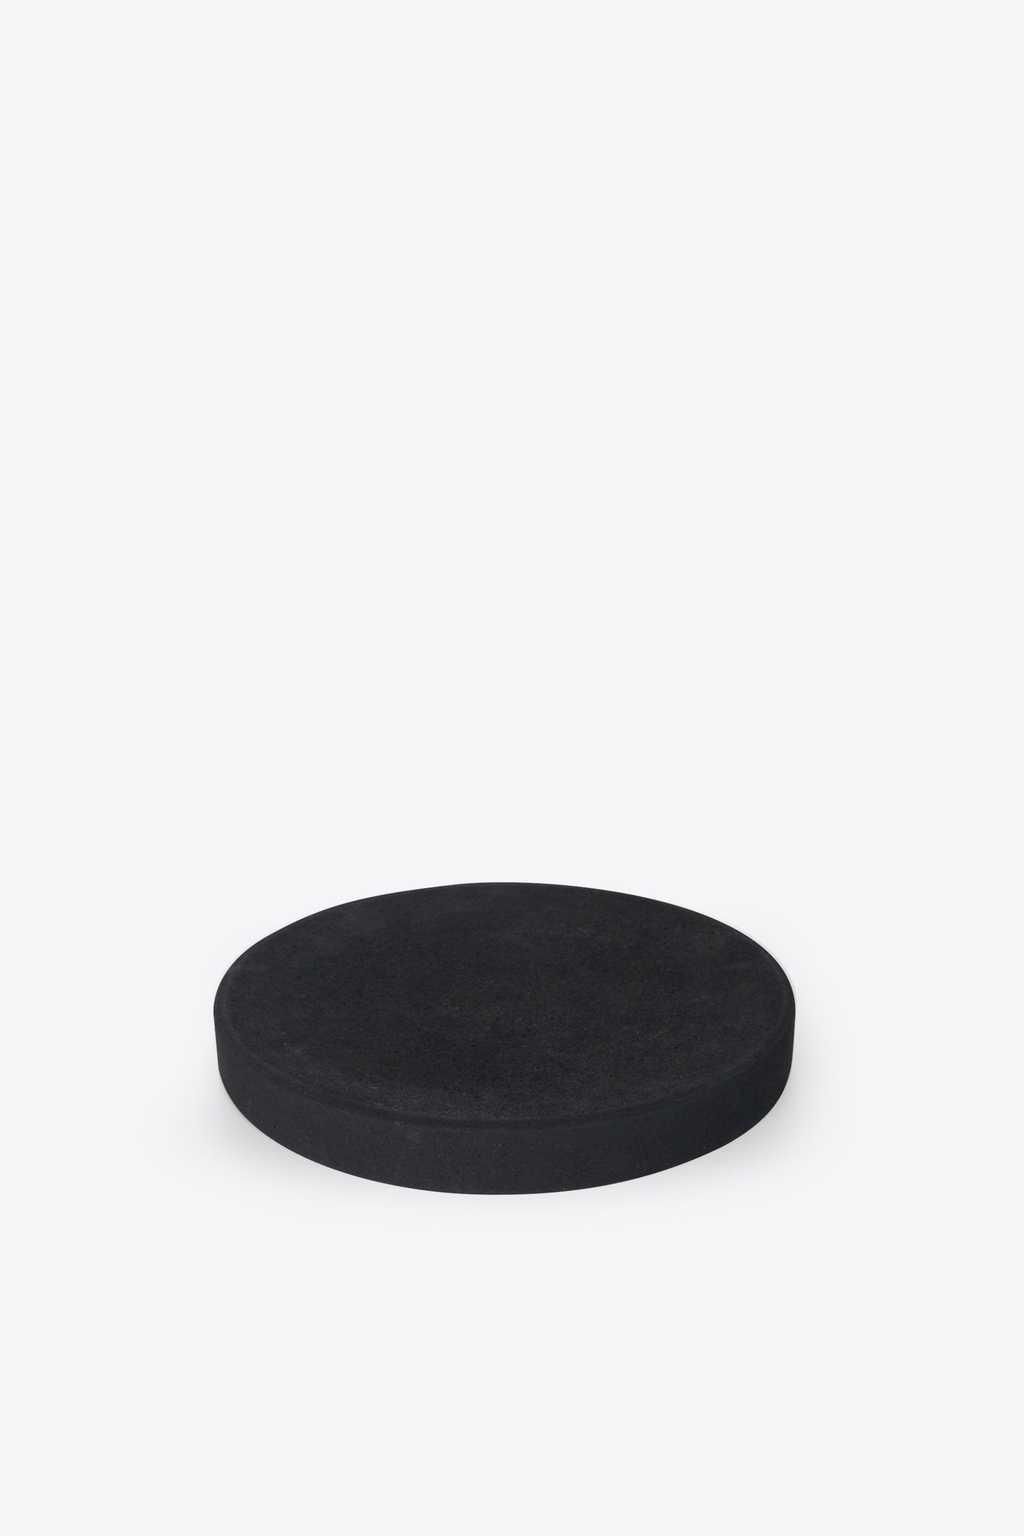 Large Cork Bowl 1038 Black 4